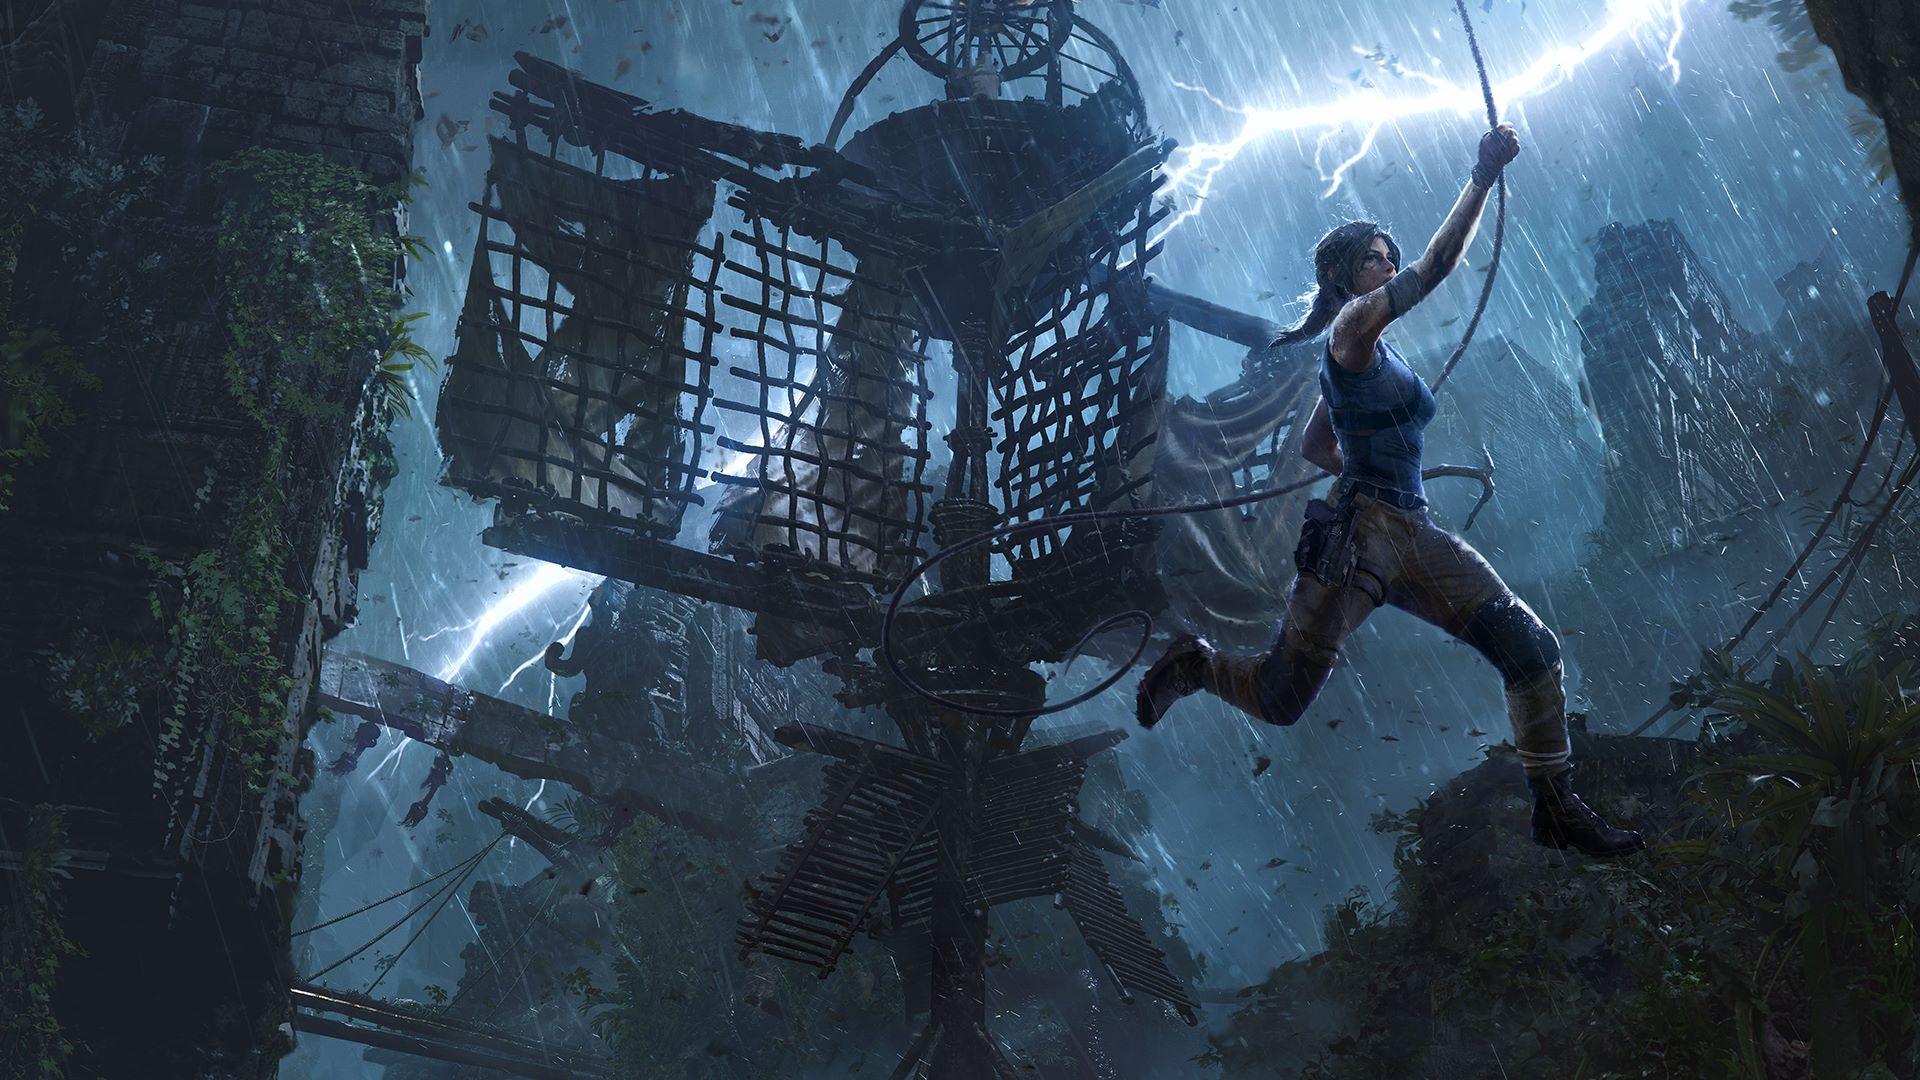 Korejská ratingová organizace ohodnotila Shadow of the Tomb Raider: Definitive Edition